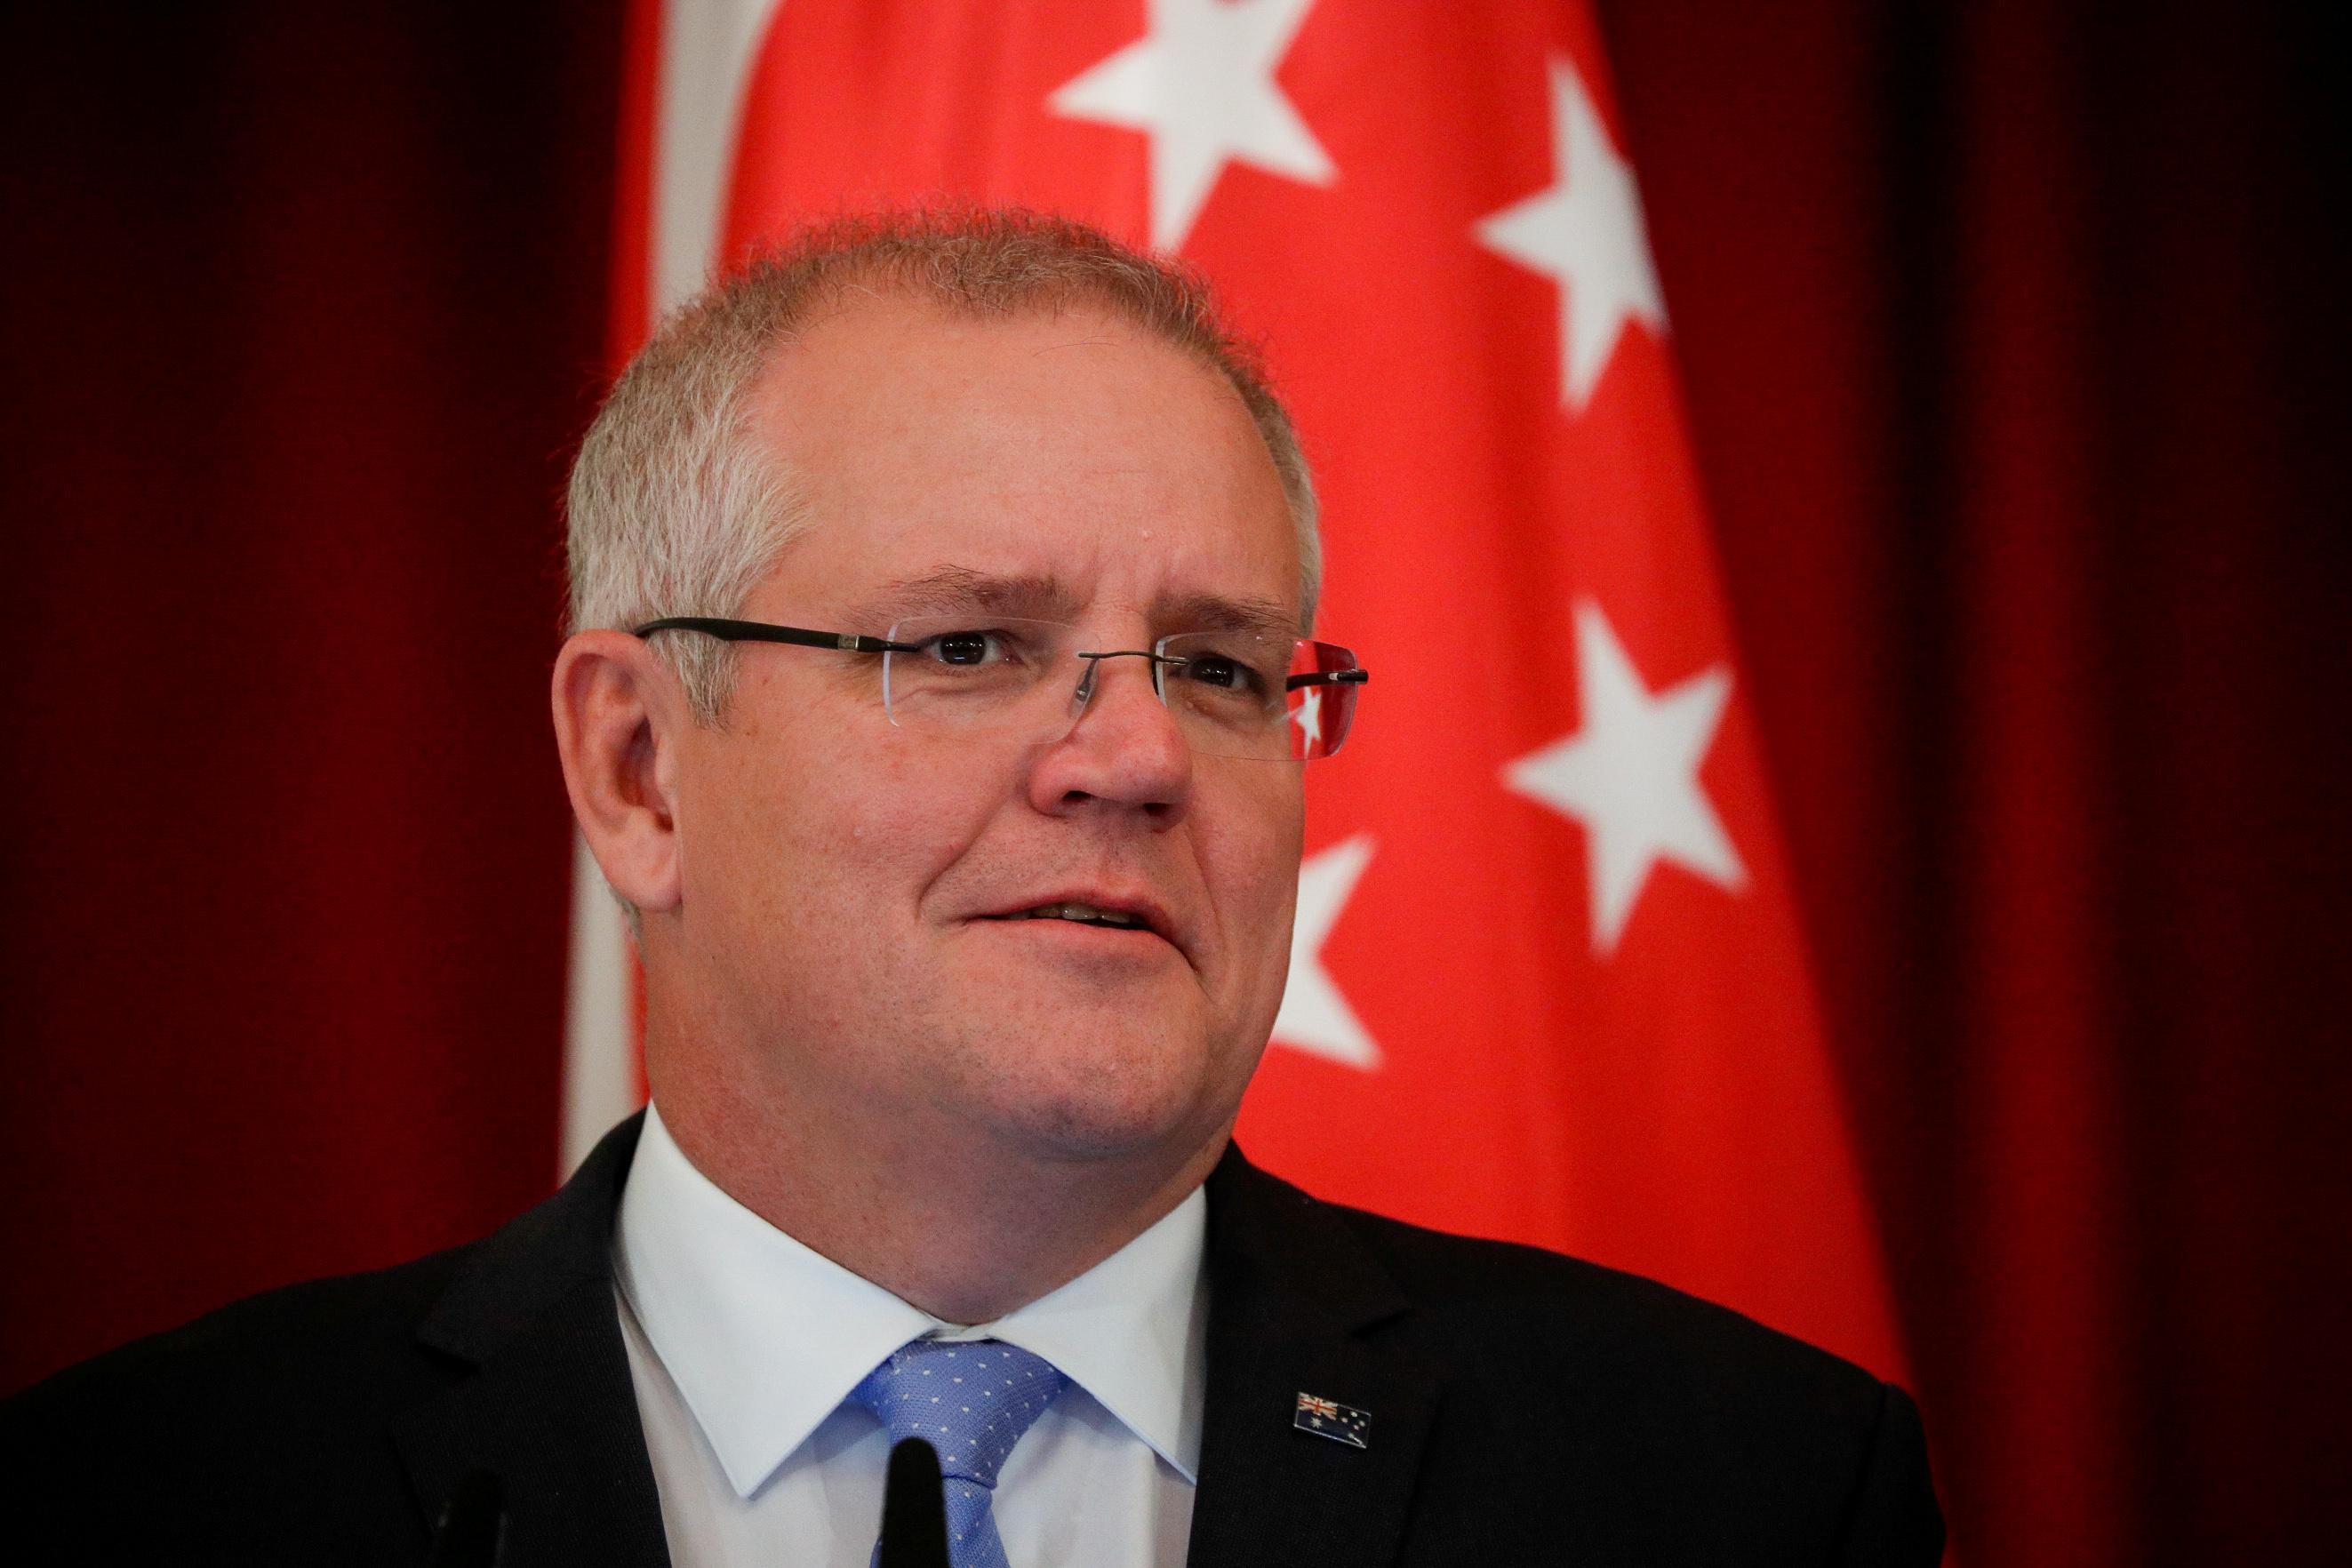 Australia says it will join U.S.-led defence effort in Strait of Hormuz